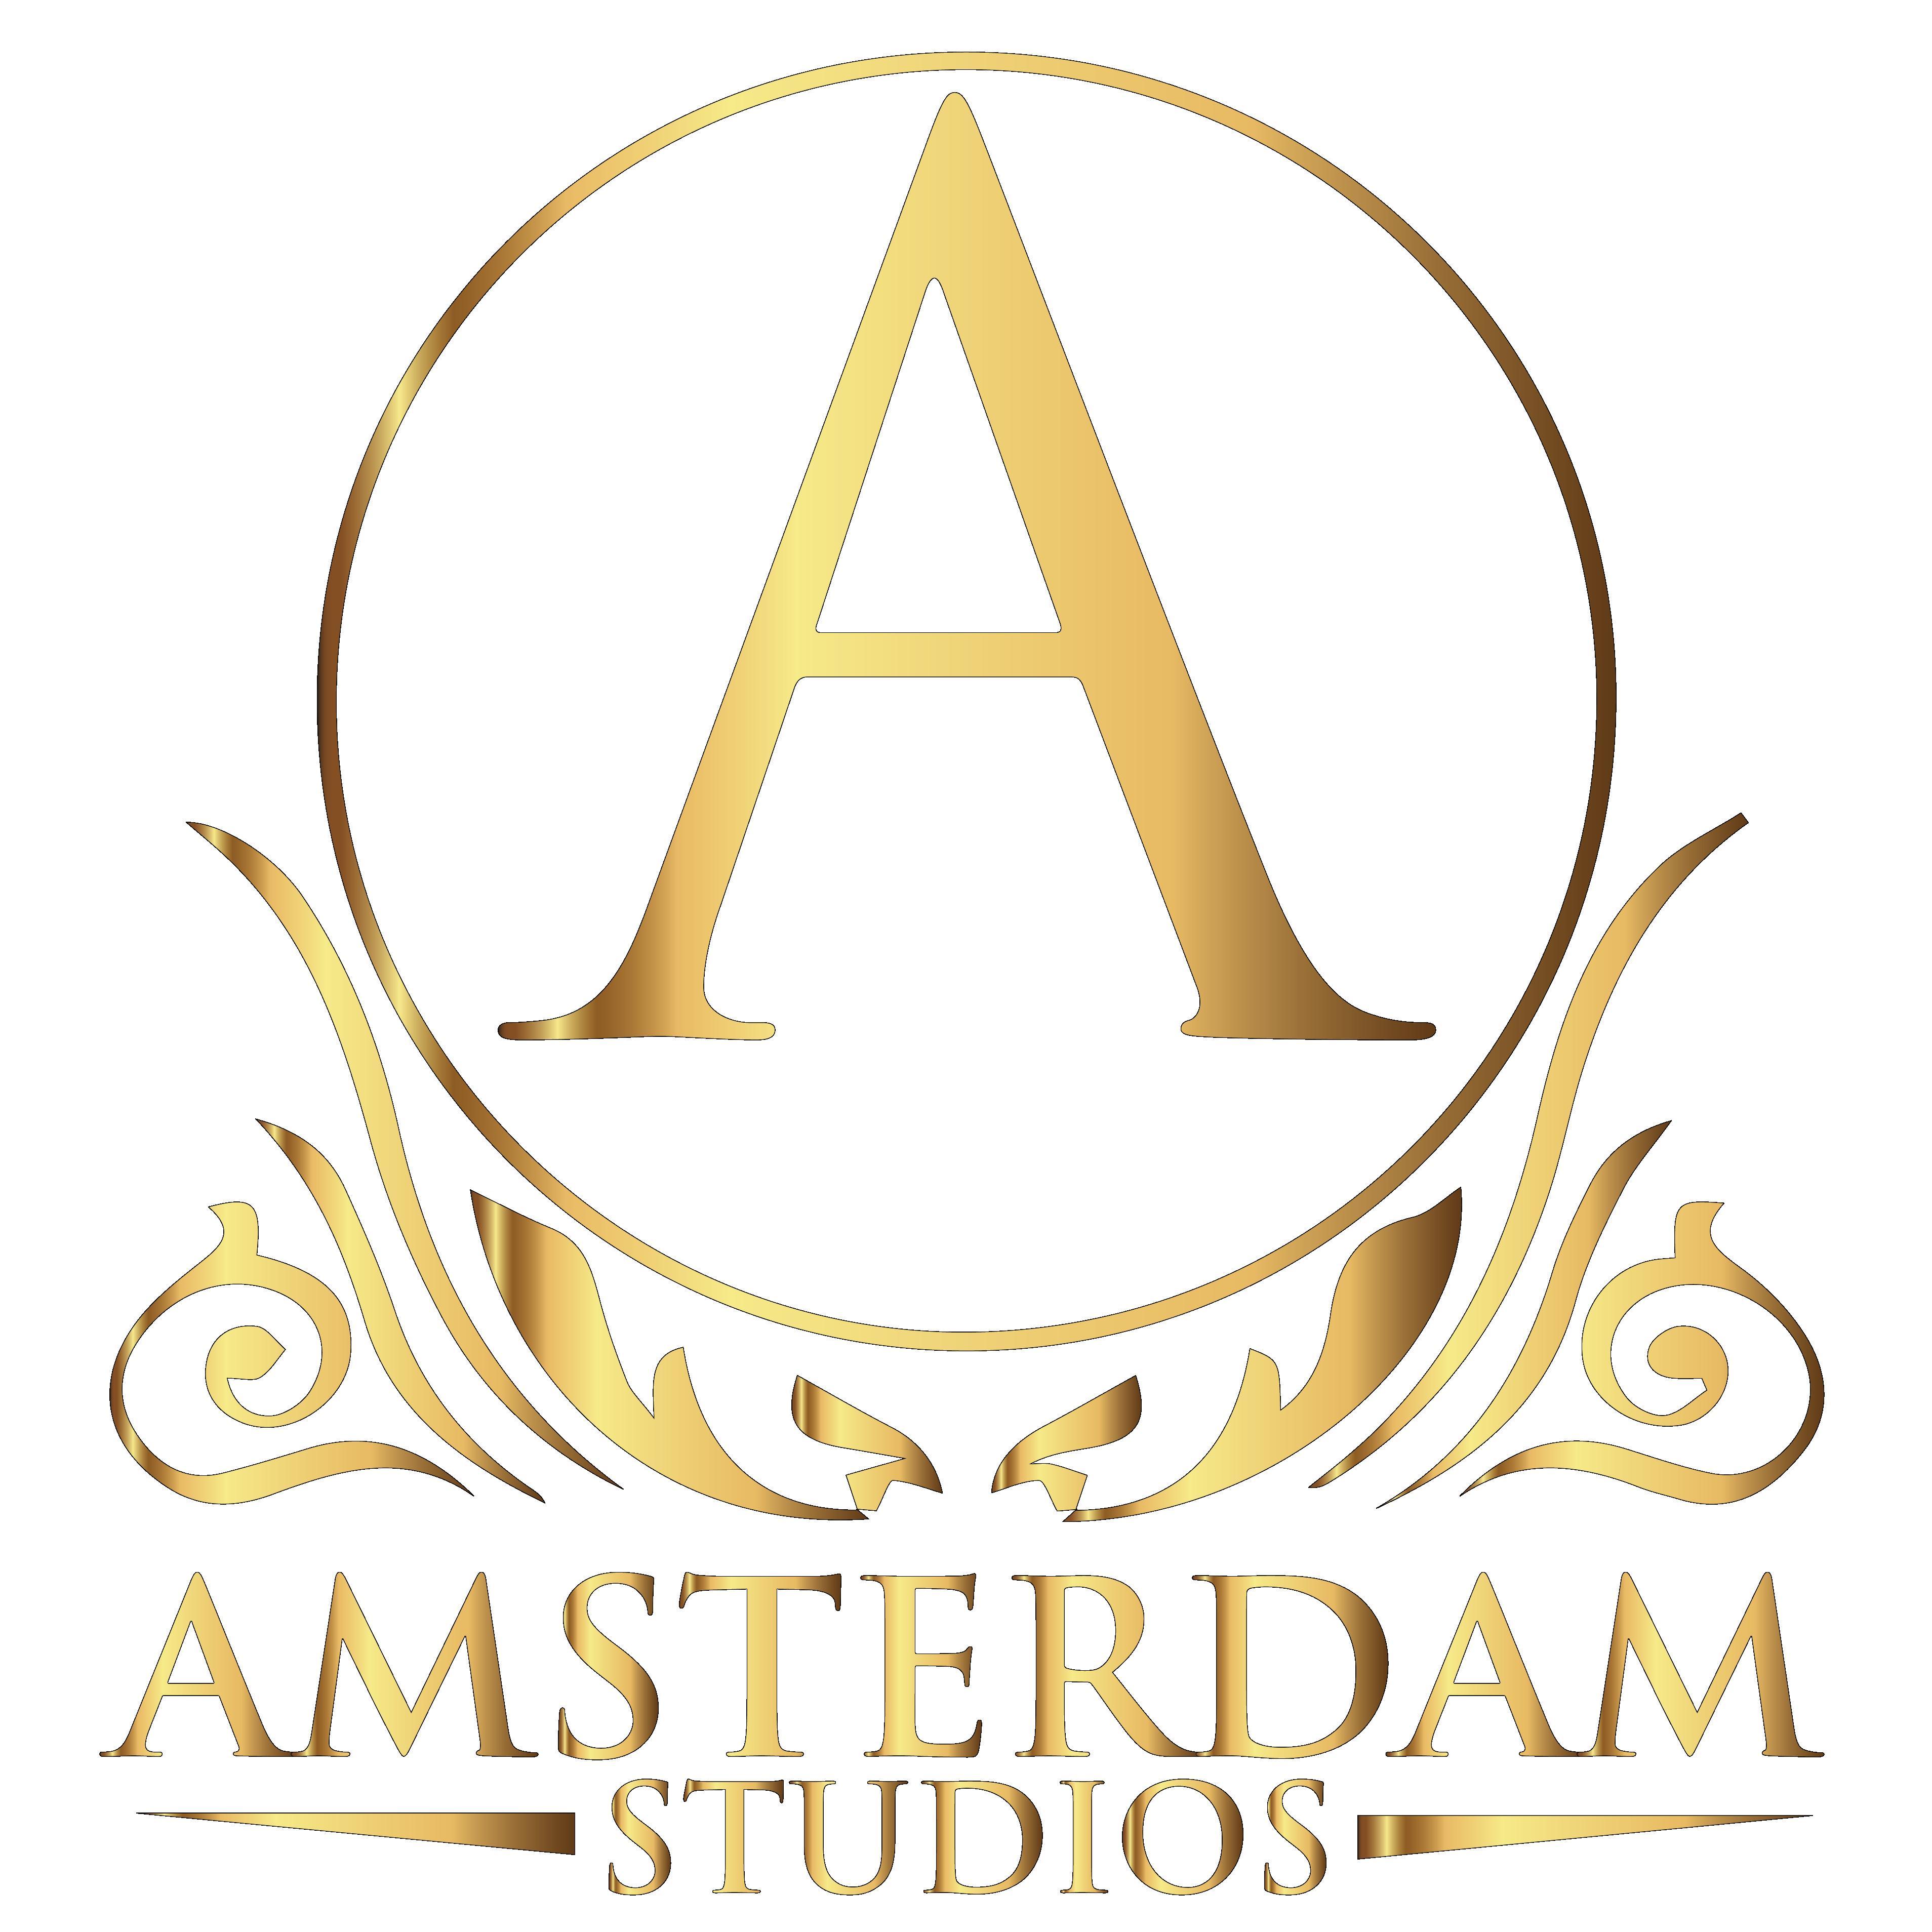 Amsterdam Studios